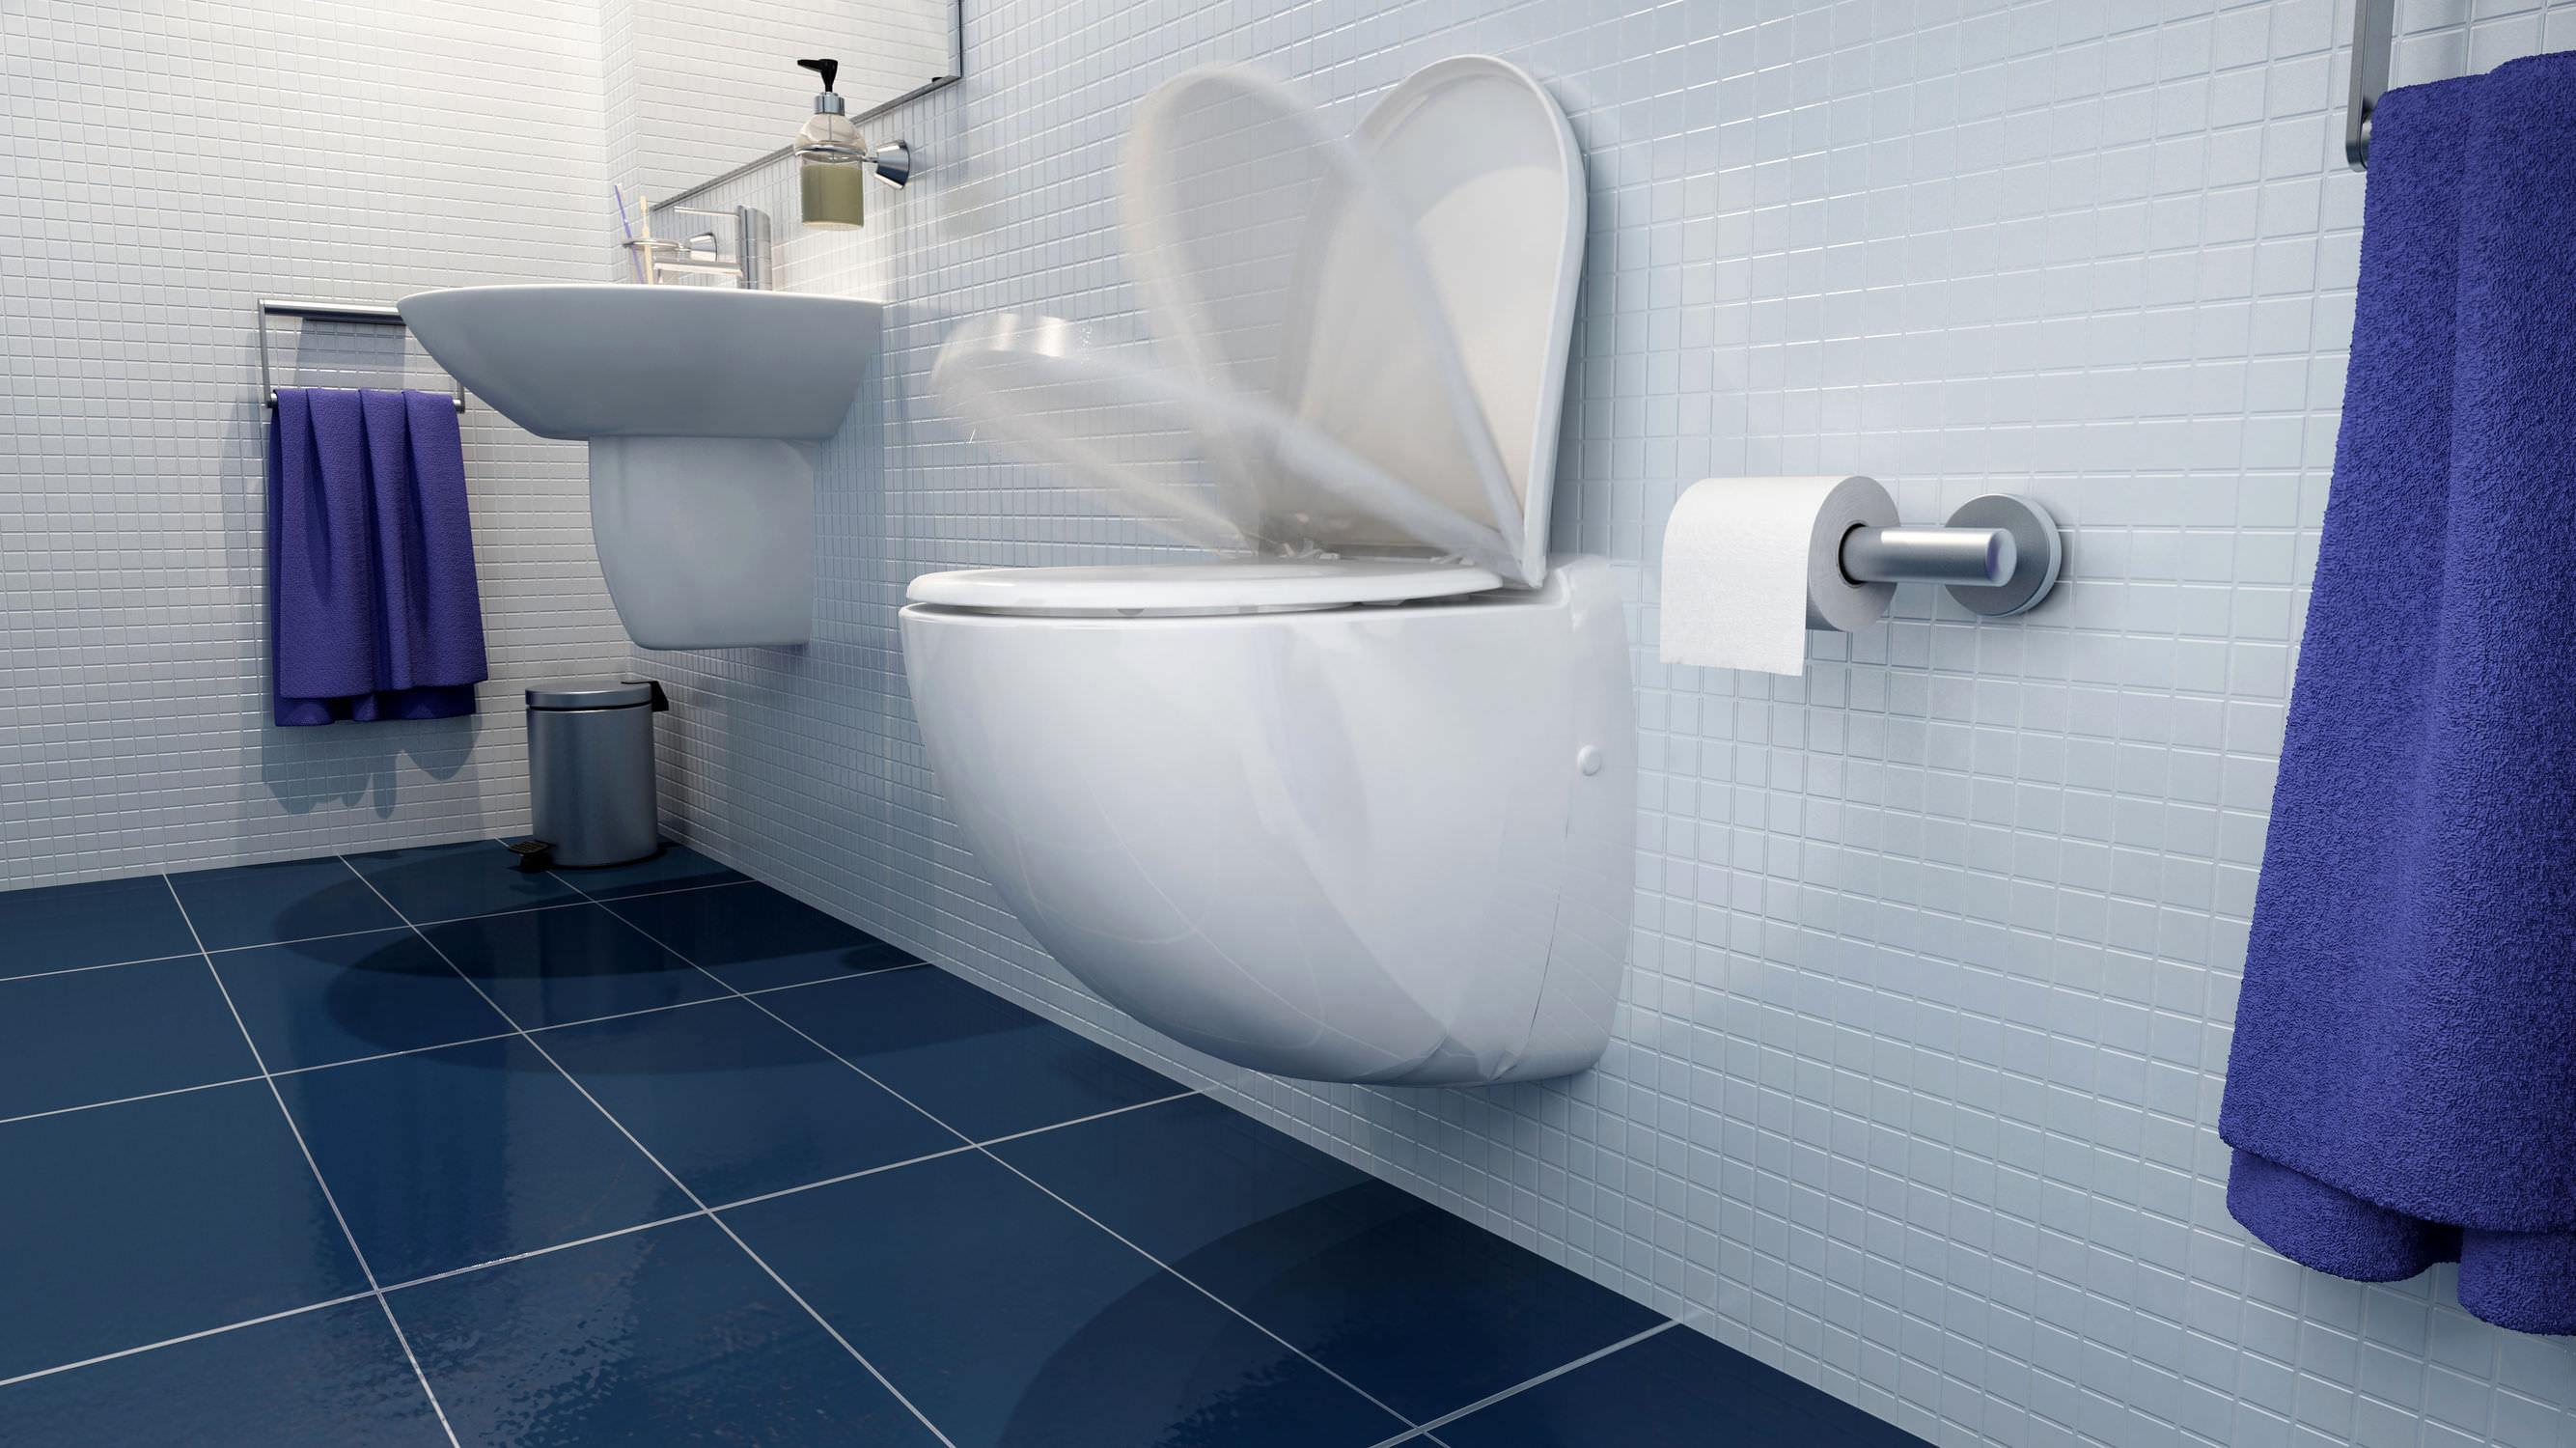 Wall-hung toilet / ceramic / with macerator - SANICOMPACT COMFORT ...